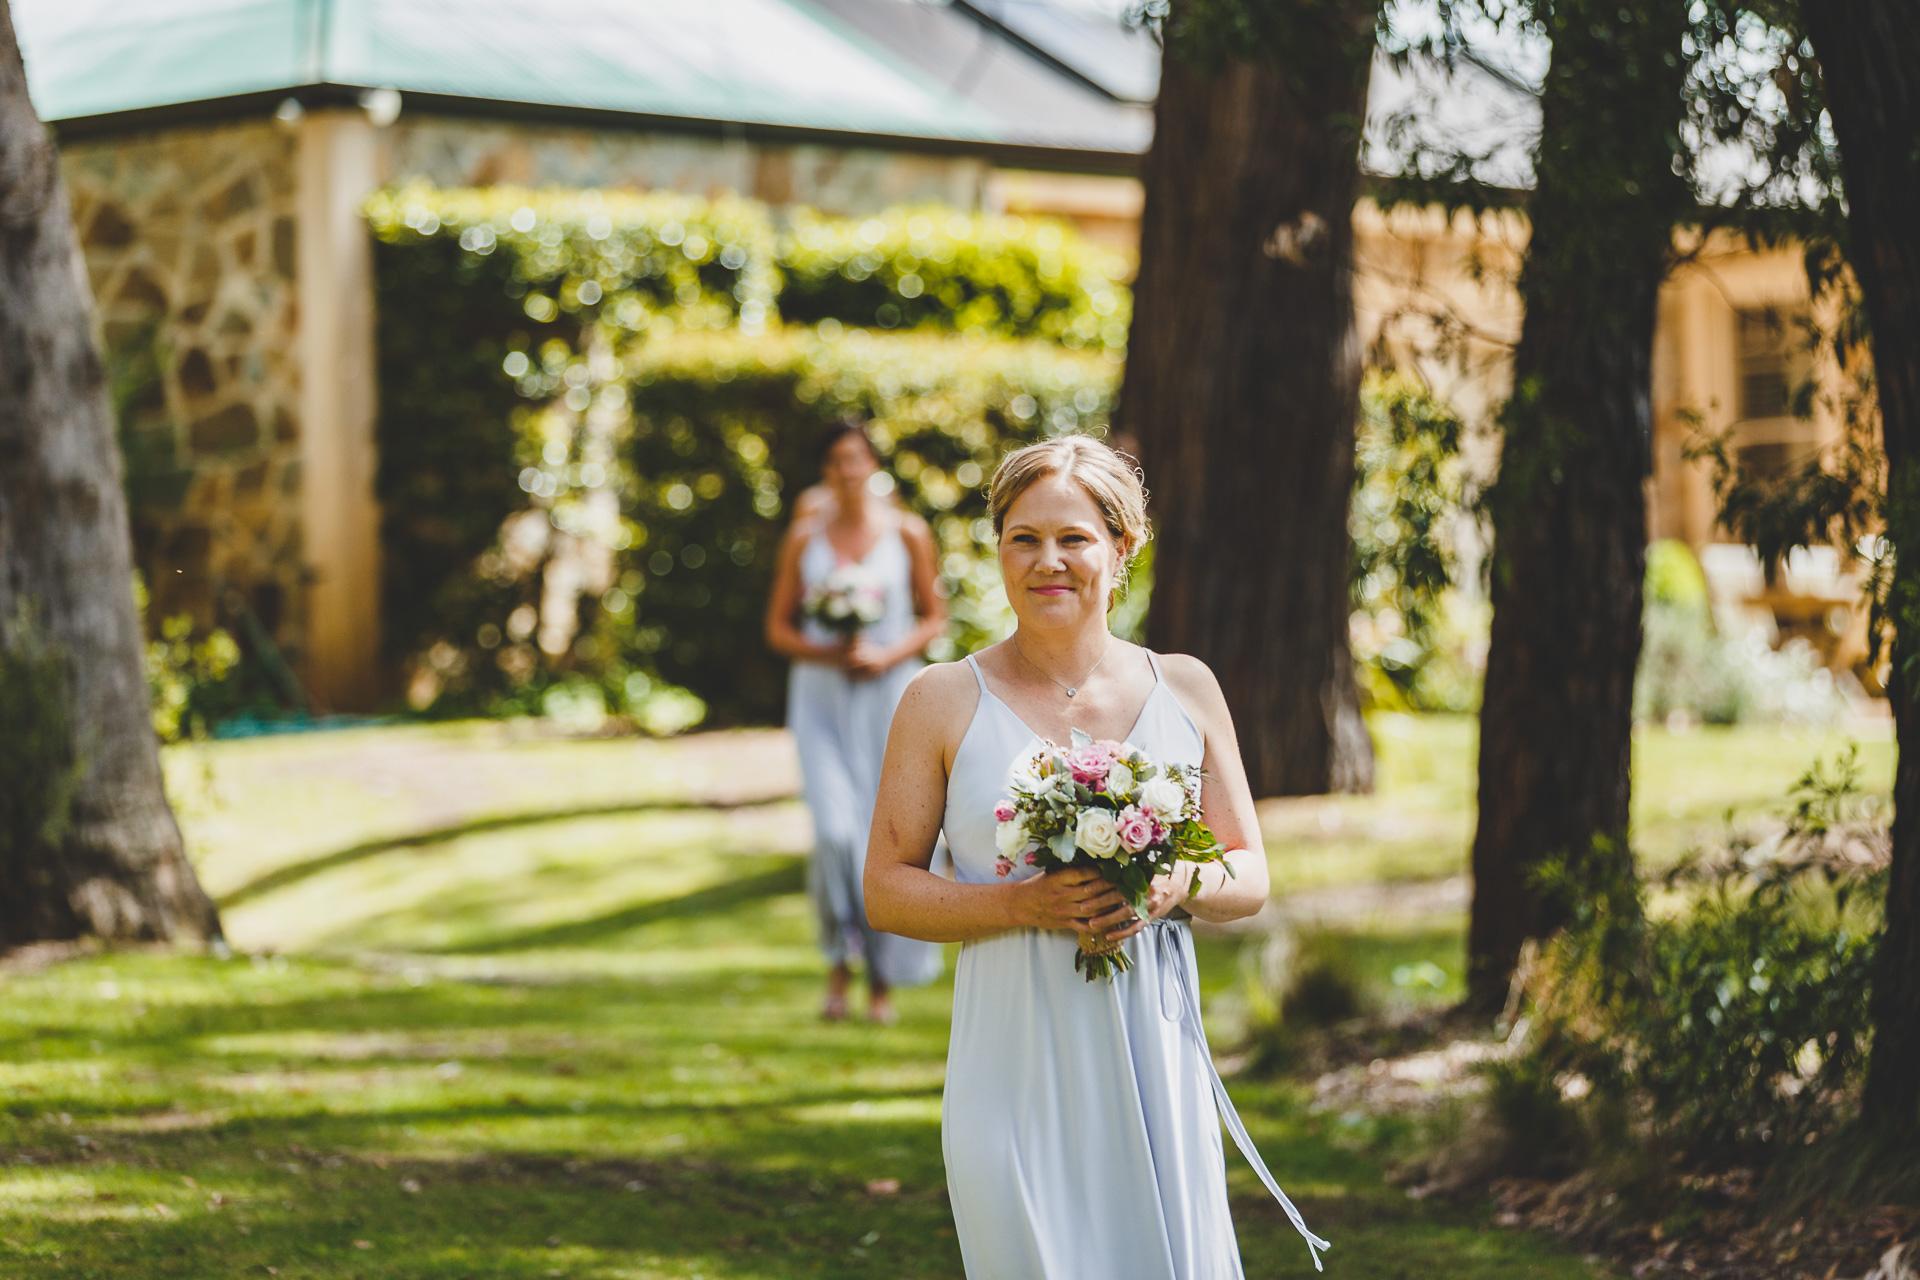 20161112 - Heath_Ruth_Wombat_Hollow_Wedding | 078.jpg